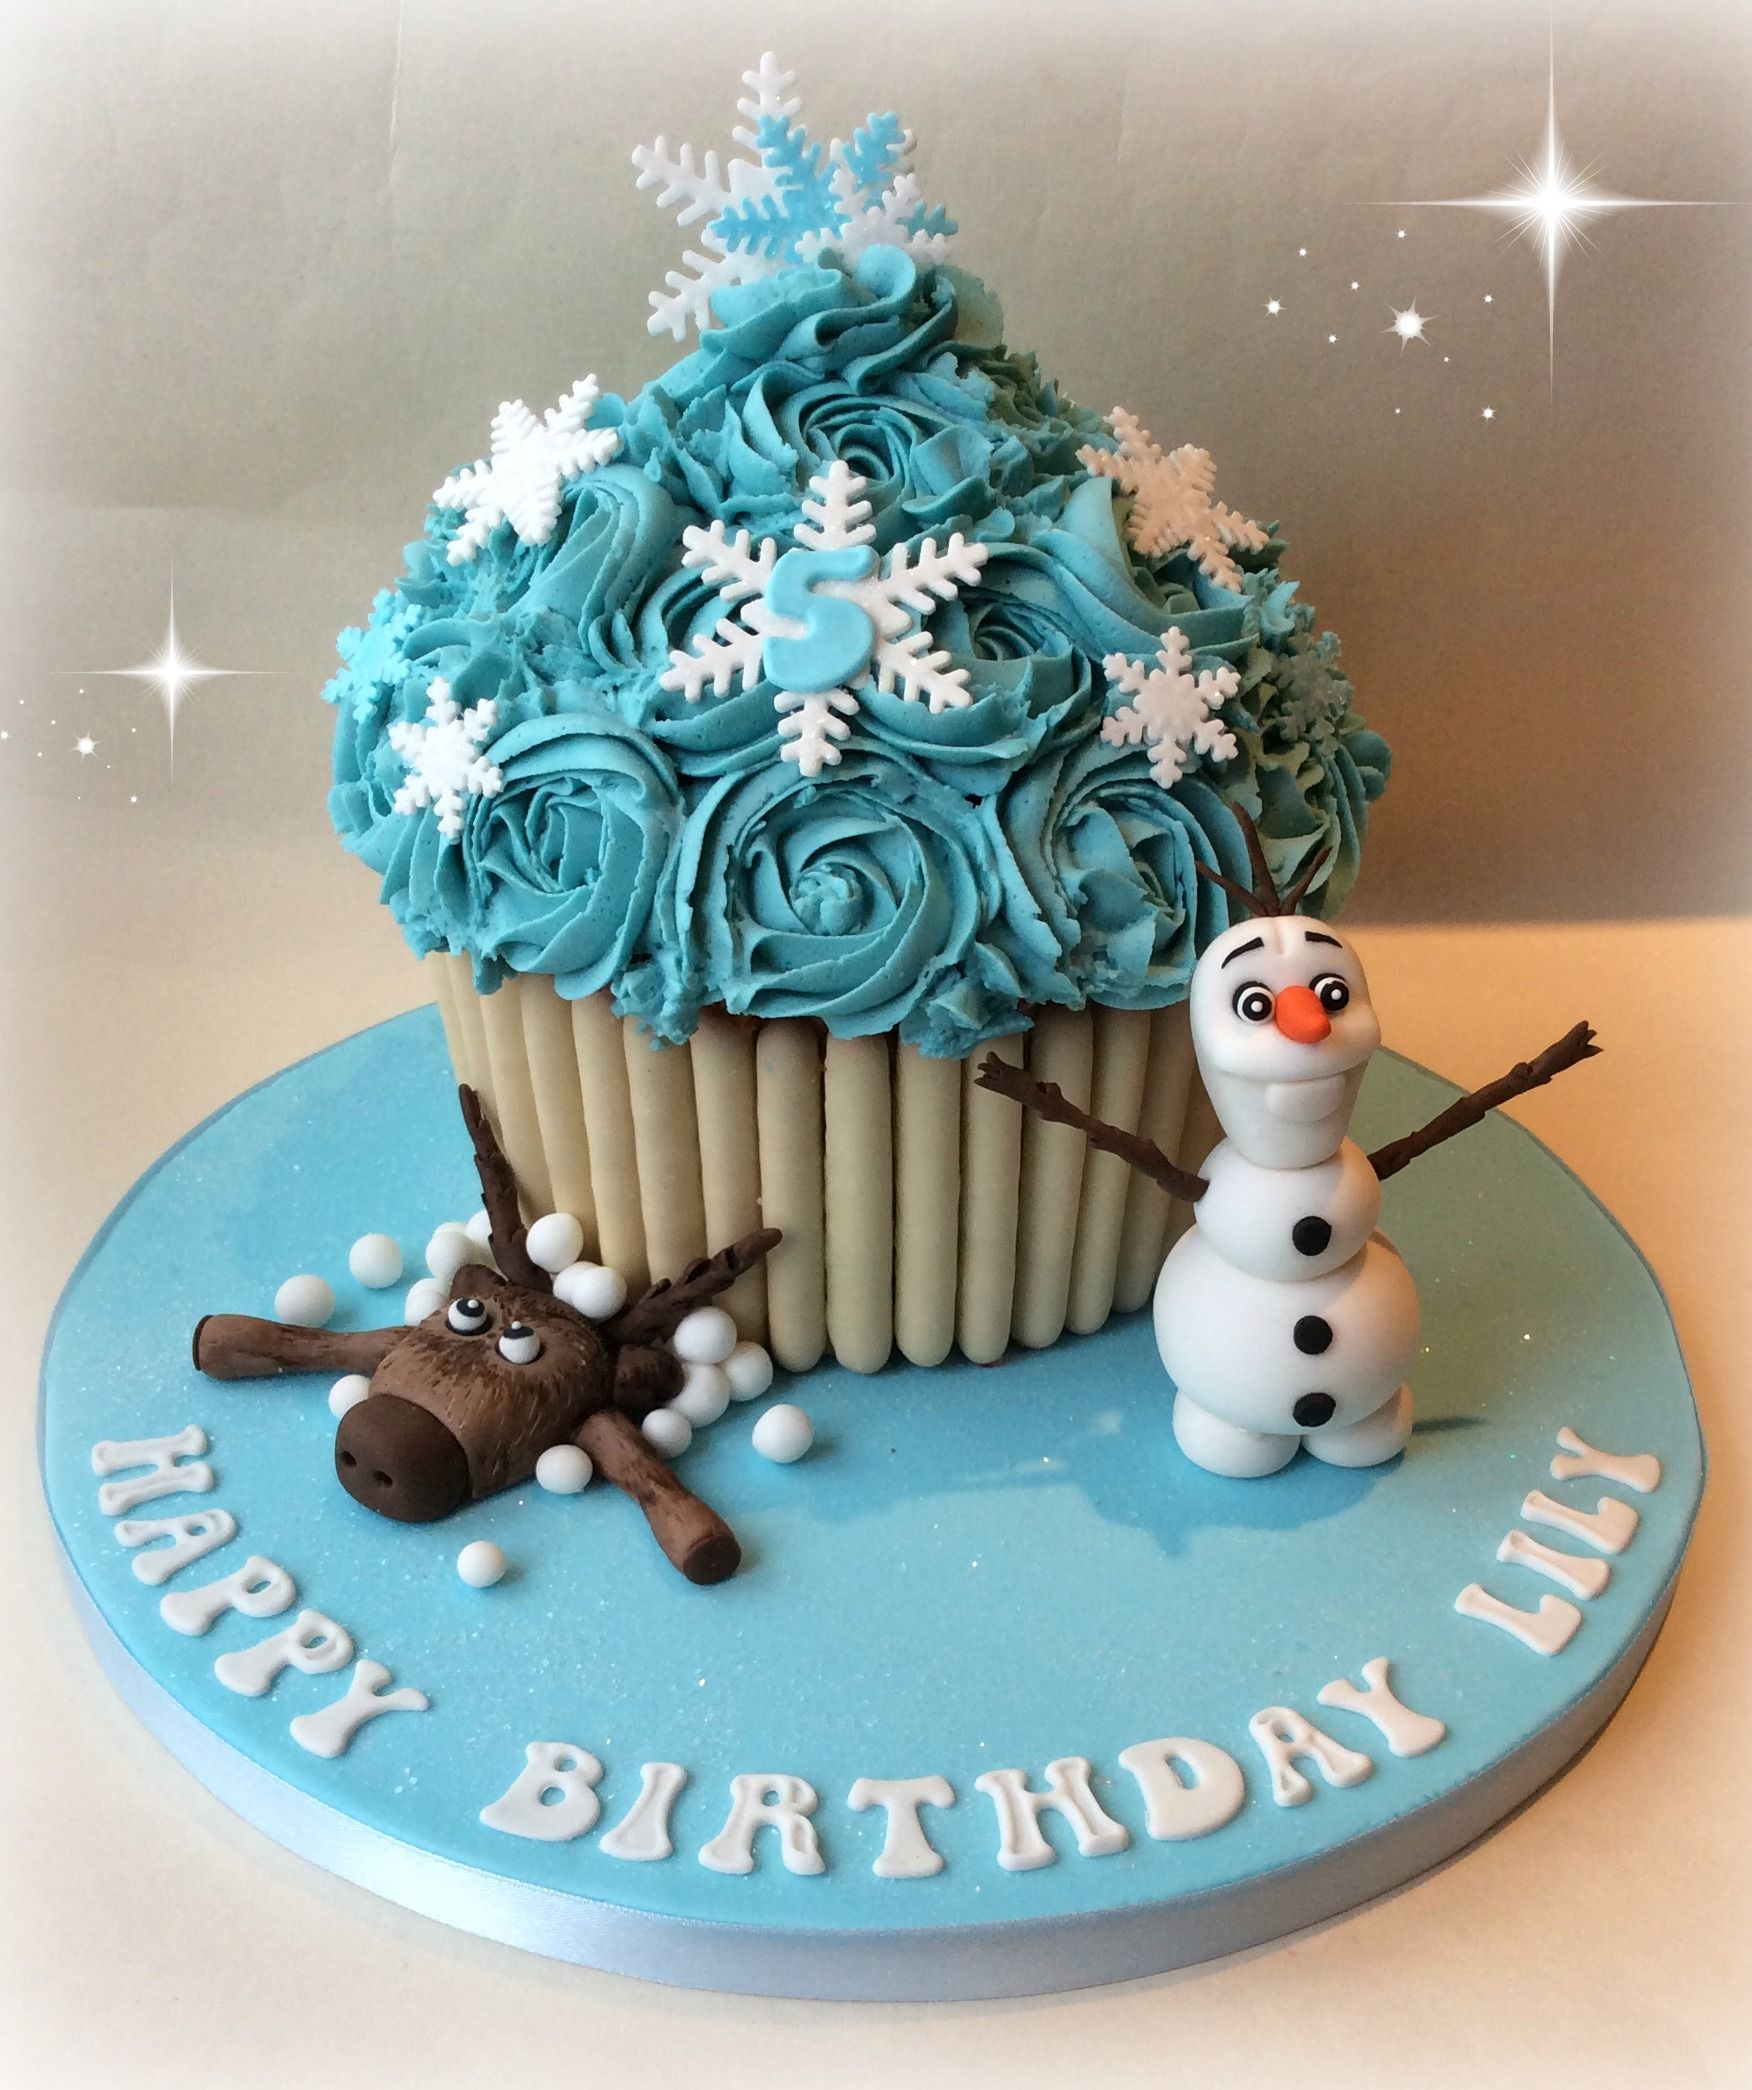 Frozen Themed Giant Cupcake Kraina Lodu Giant